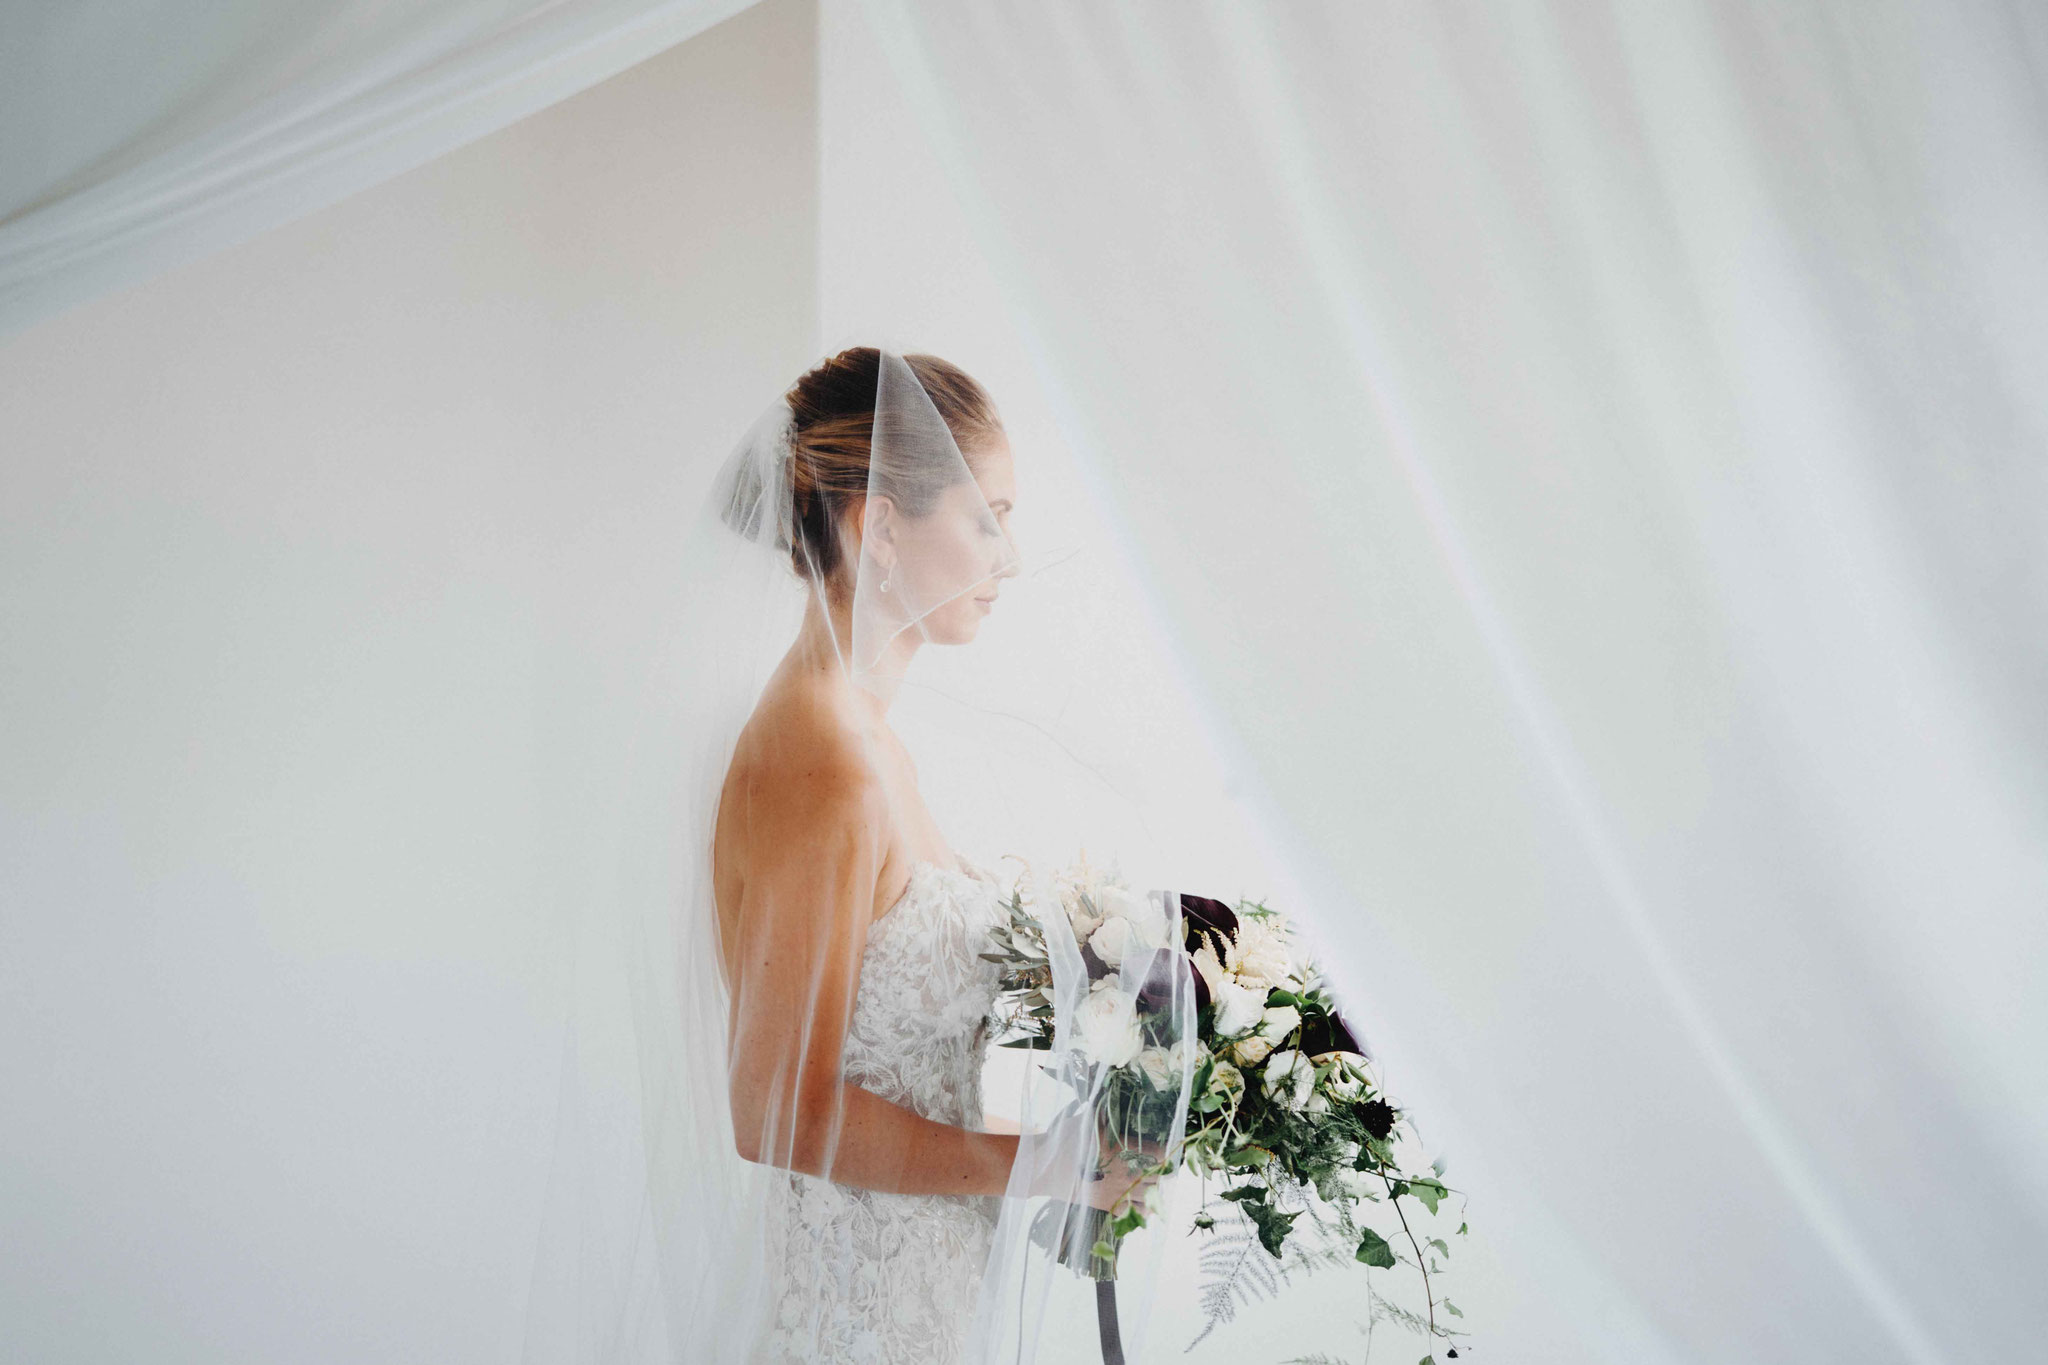 florence_wedding_photographer_08